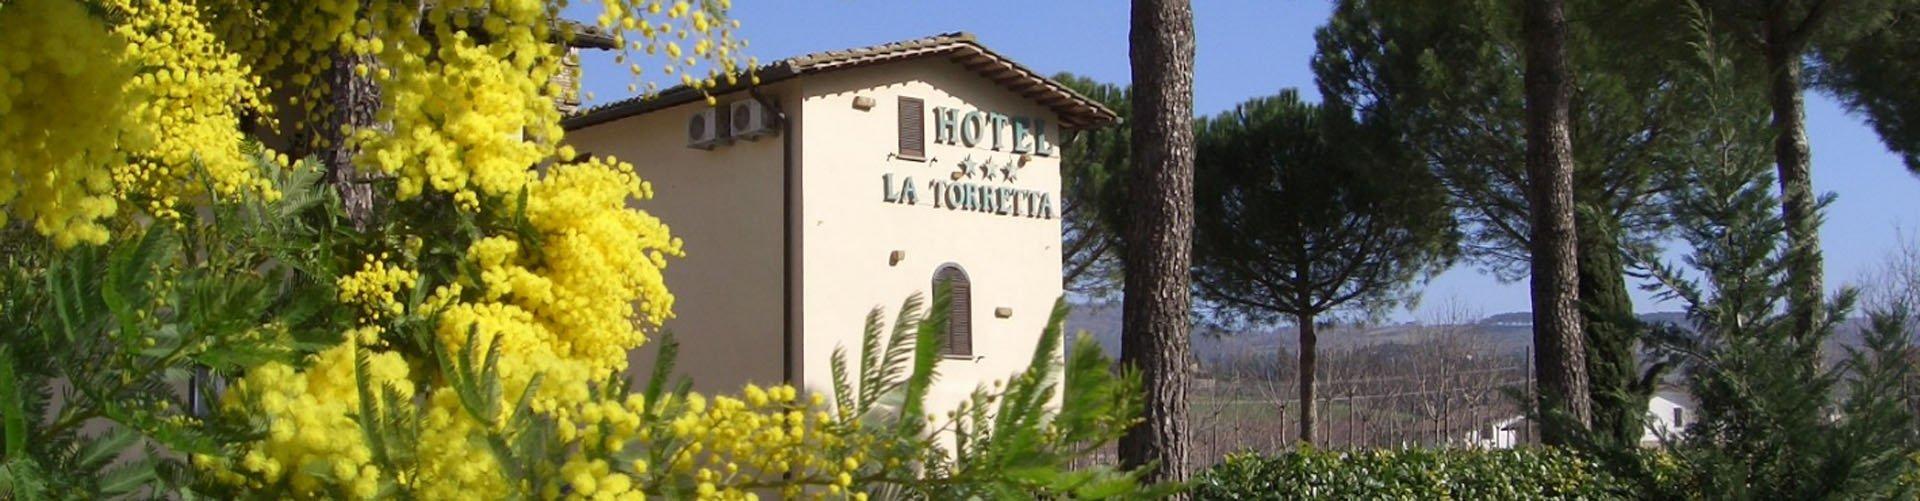 Hotel la Torretta in Umbrië